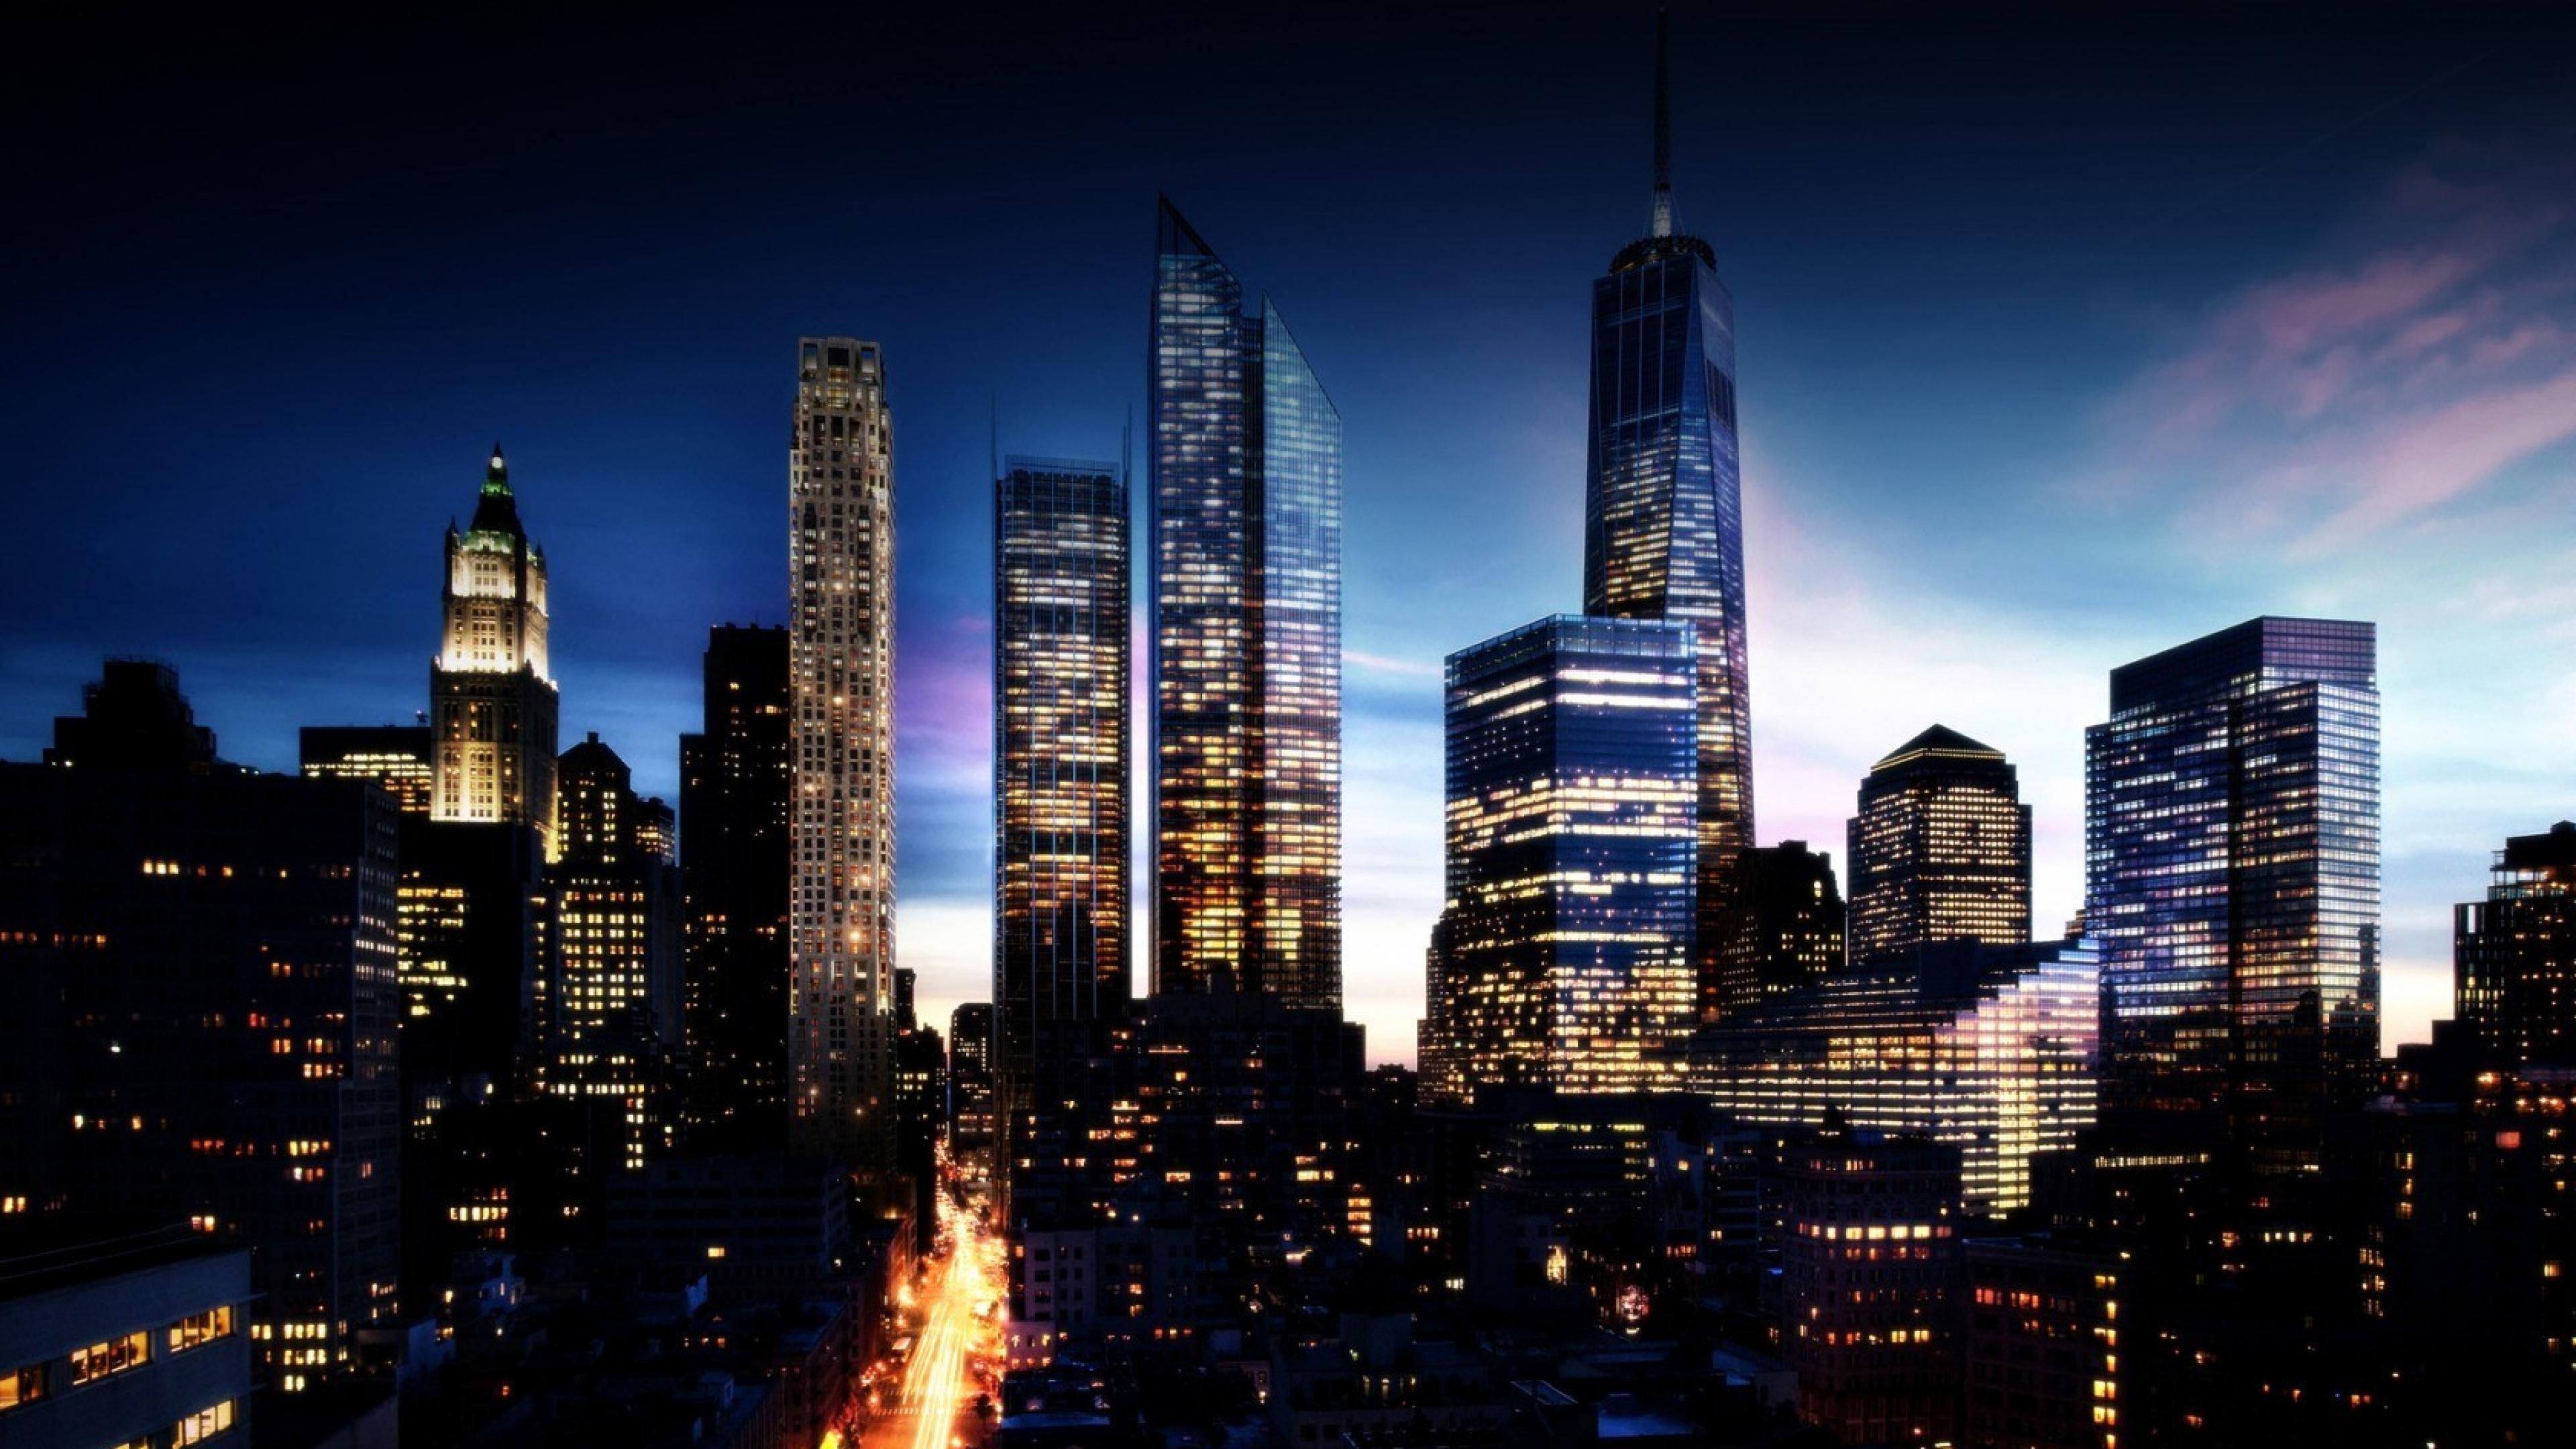 3840x2160 Wallpaper city night lights city lights buildings sky 3840x2160